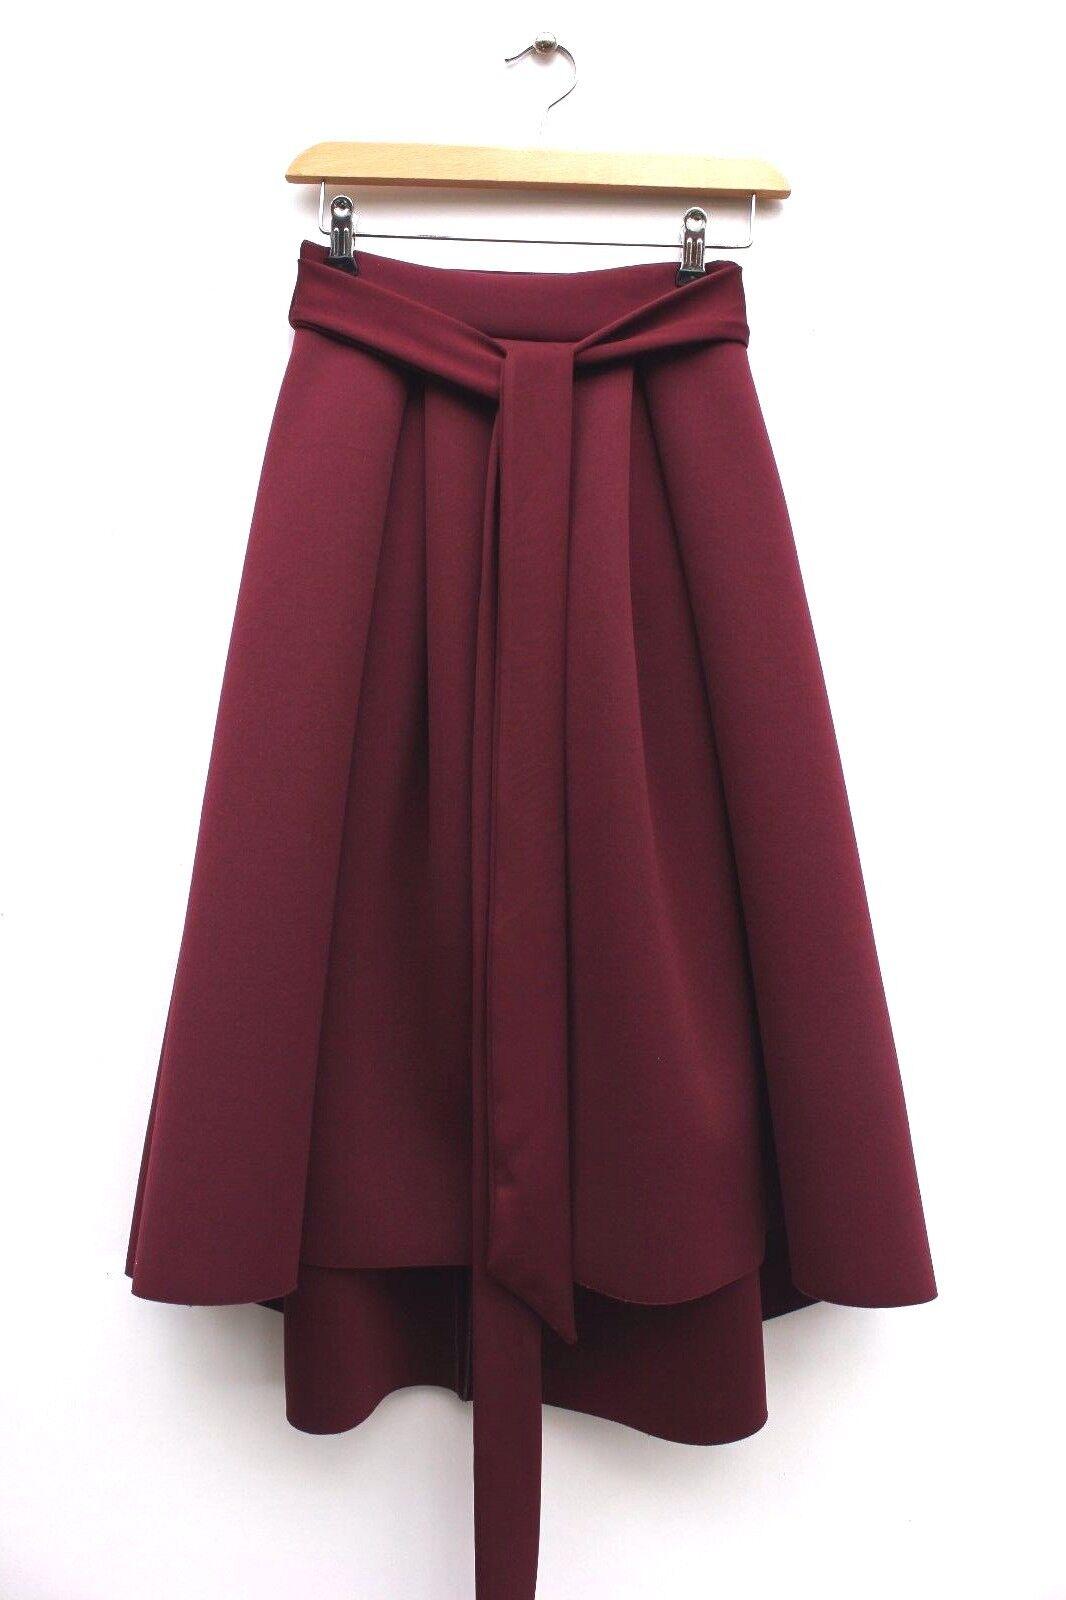 Asos Premium High Low Midi Occasion Scuba Bonded Dress Wedding Prom Skirt 6 34